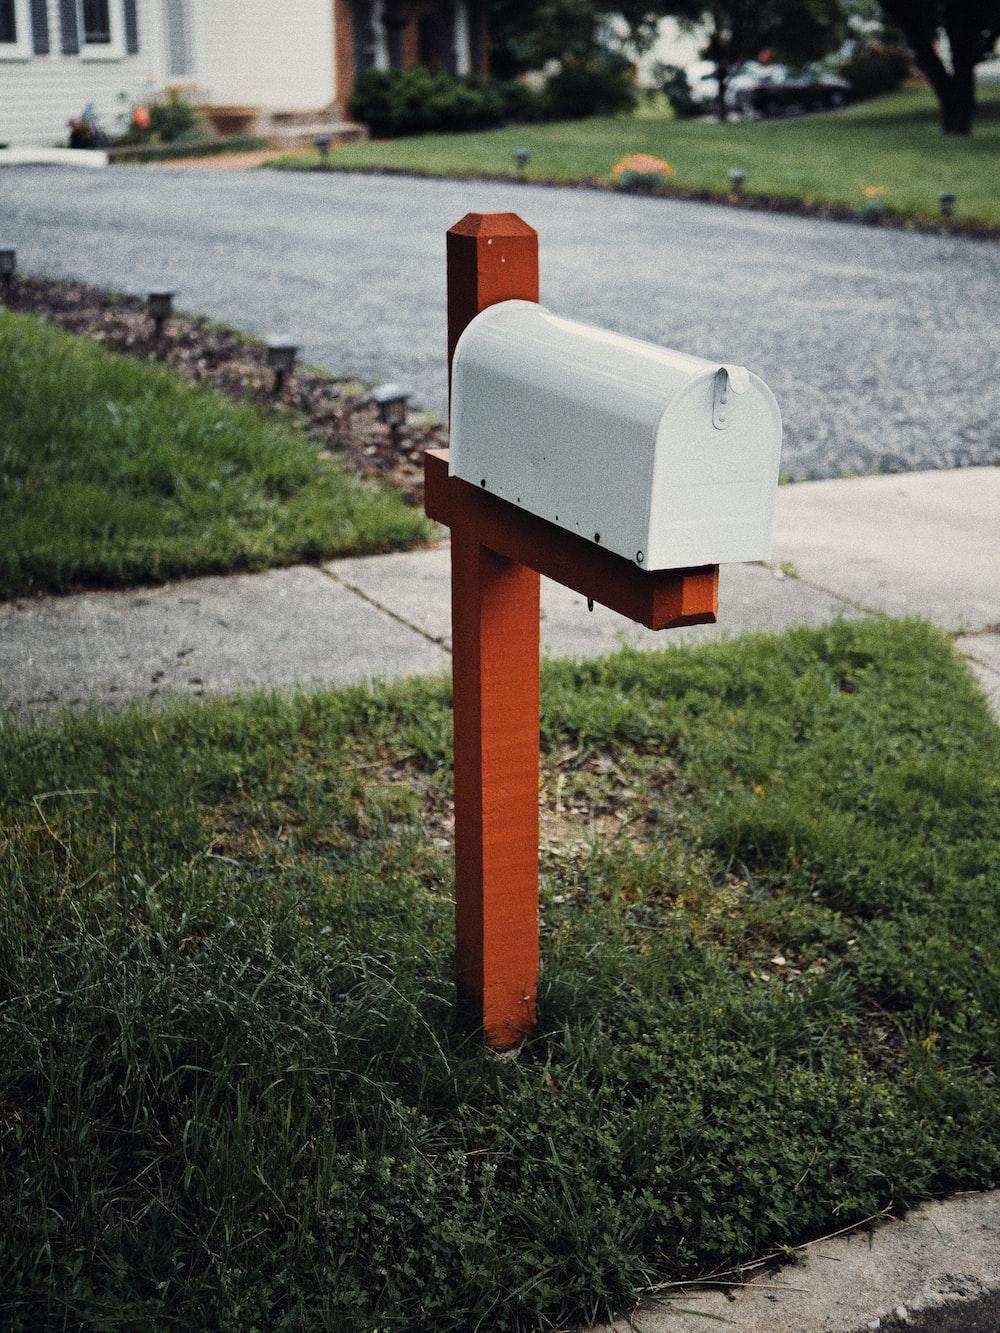 Muriwai Mailboxes Photo By Mathyas Kurmann Mathyaskurmann On Unsplash Cadillac Seville Sts Hi Im Looking For The Pcm Wiring Diagram Gray Metal Mail Box